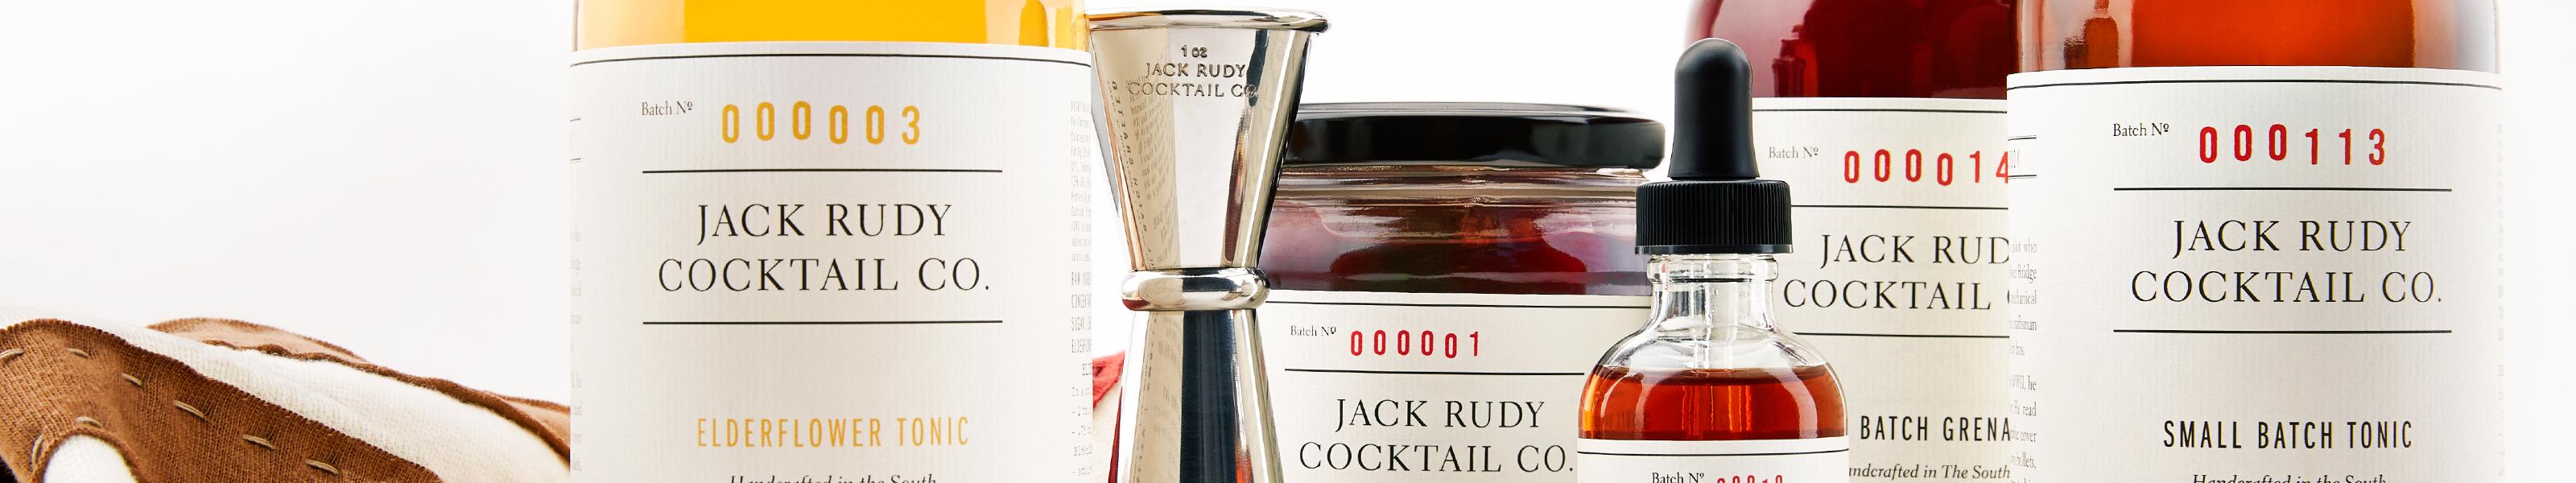 Jackrudy header.jpg?ixlib=rails 2.1